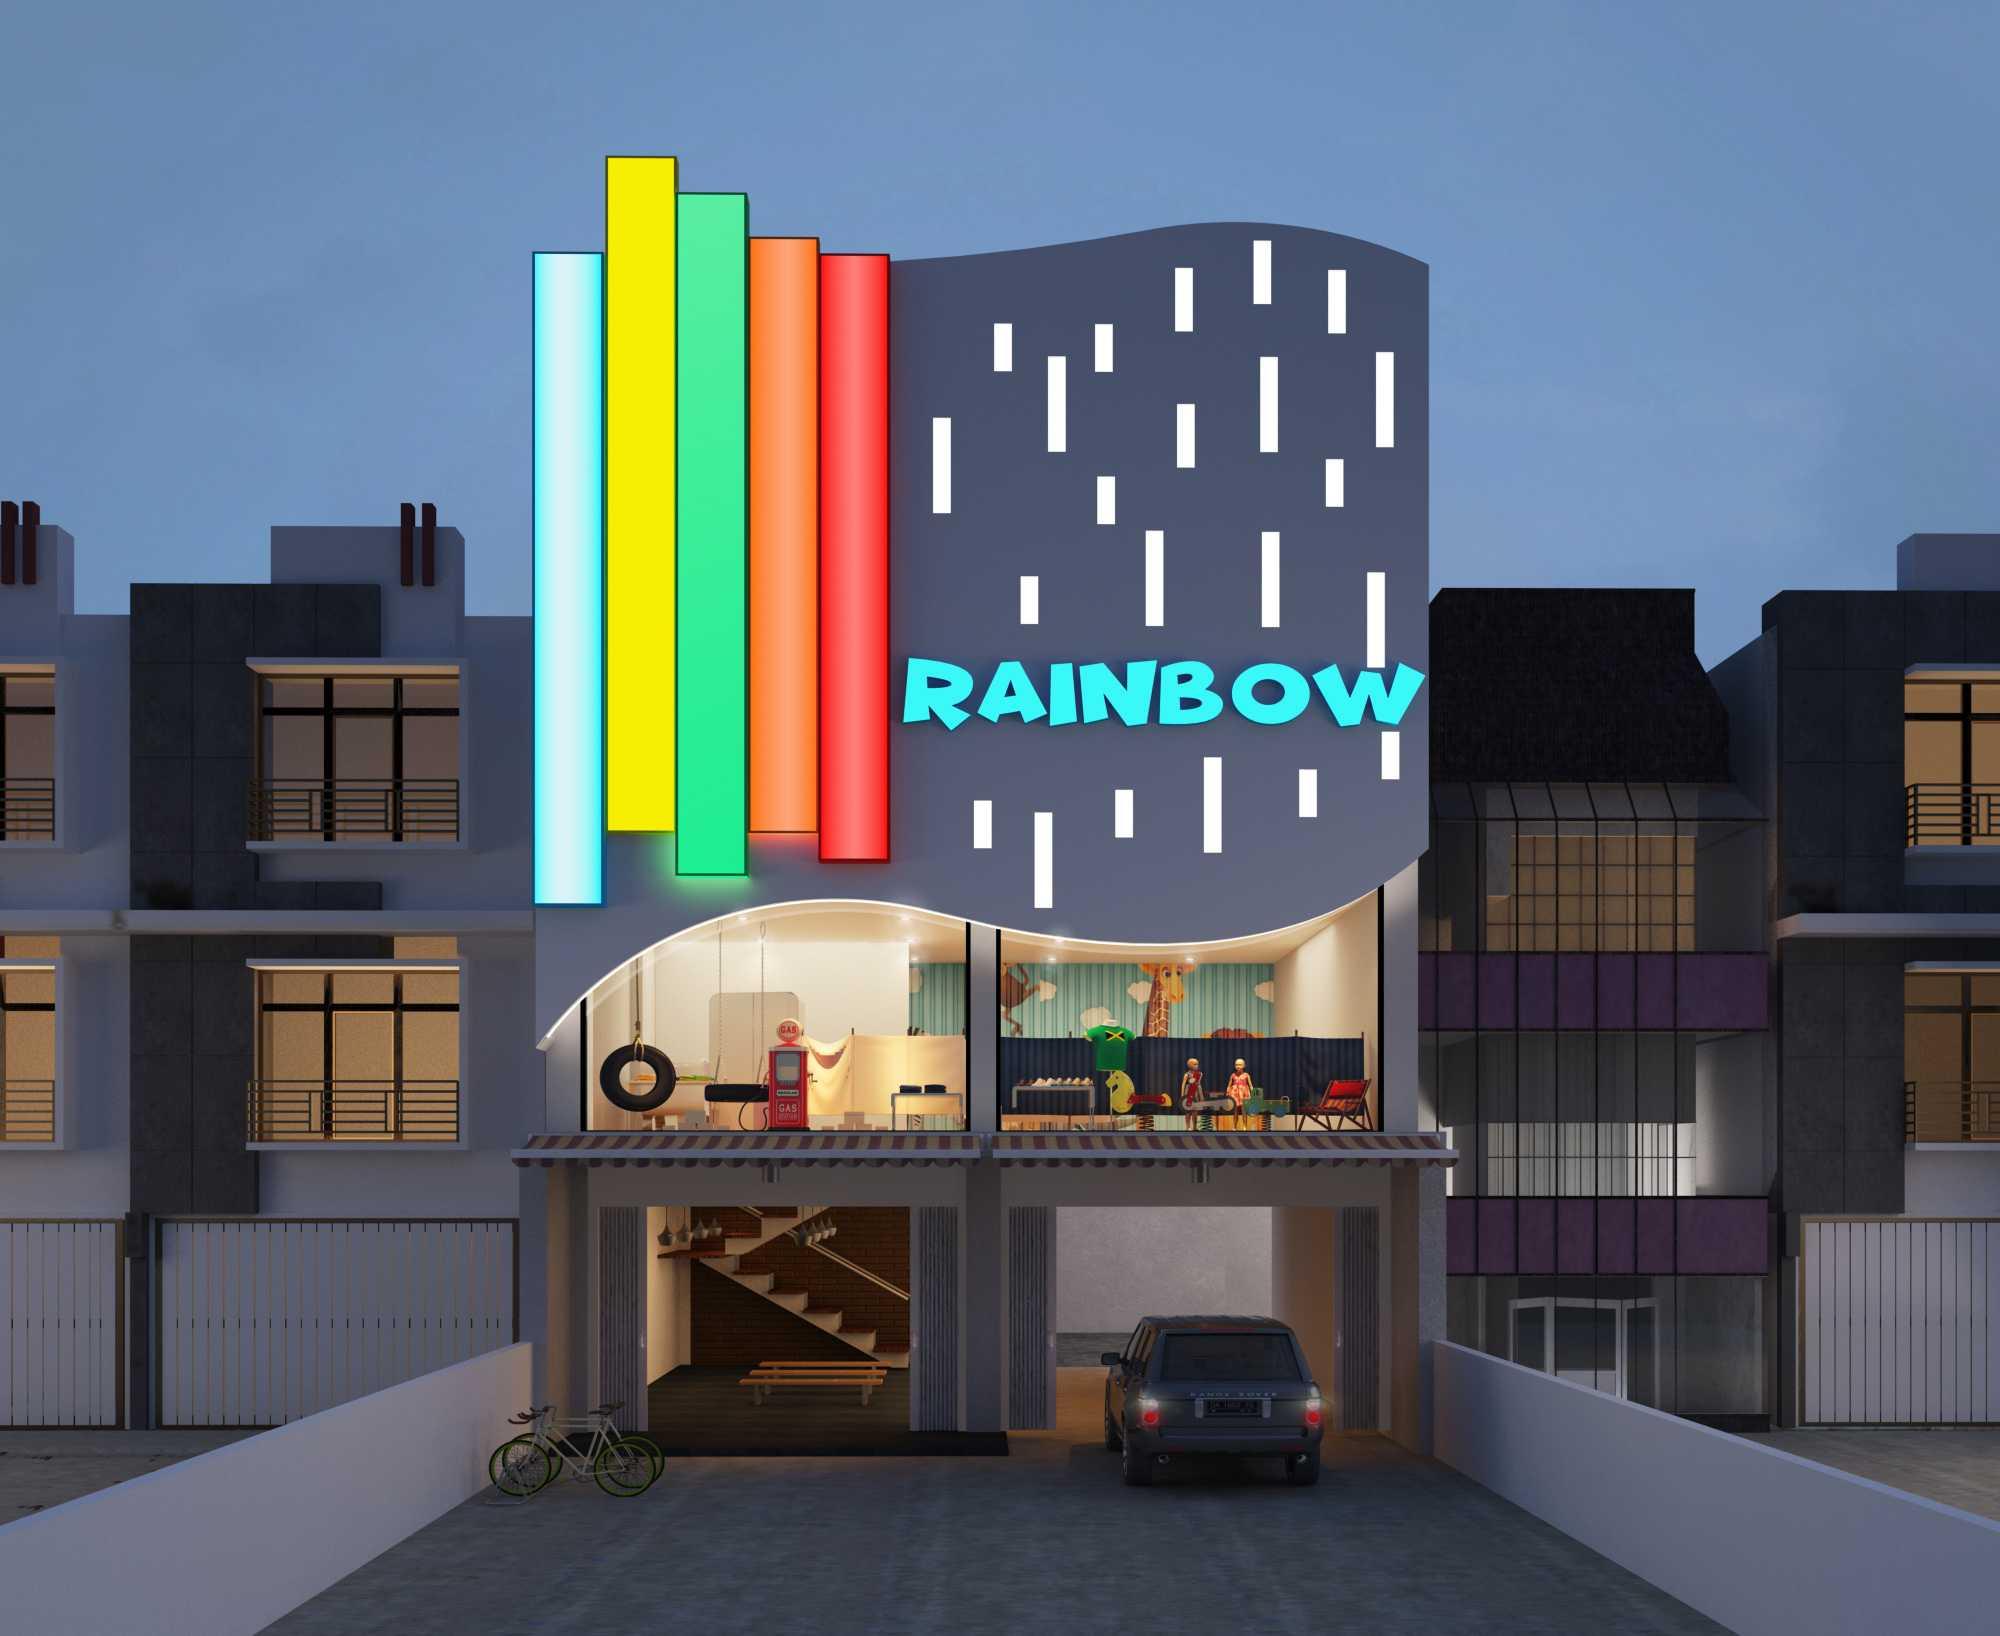 Acia Interior Baby And Kids Store Rainbow Banjarmasin, Kota Banjarmasin, Kalimantan Selatan, Indonesia Banjarmasin, Kota Banjarmasin, Kalimantan Selatan, Indonesia Acia-Interior-Baby-And-Kids-Store-Rainbow  63067